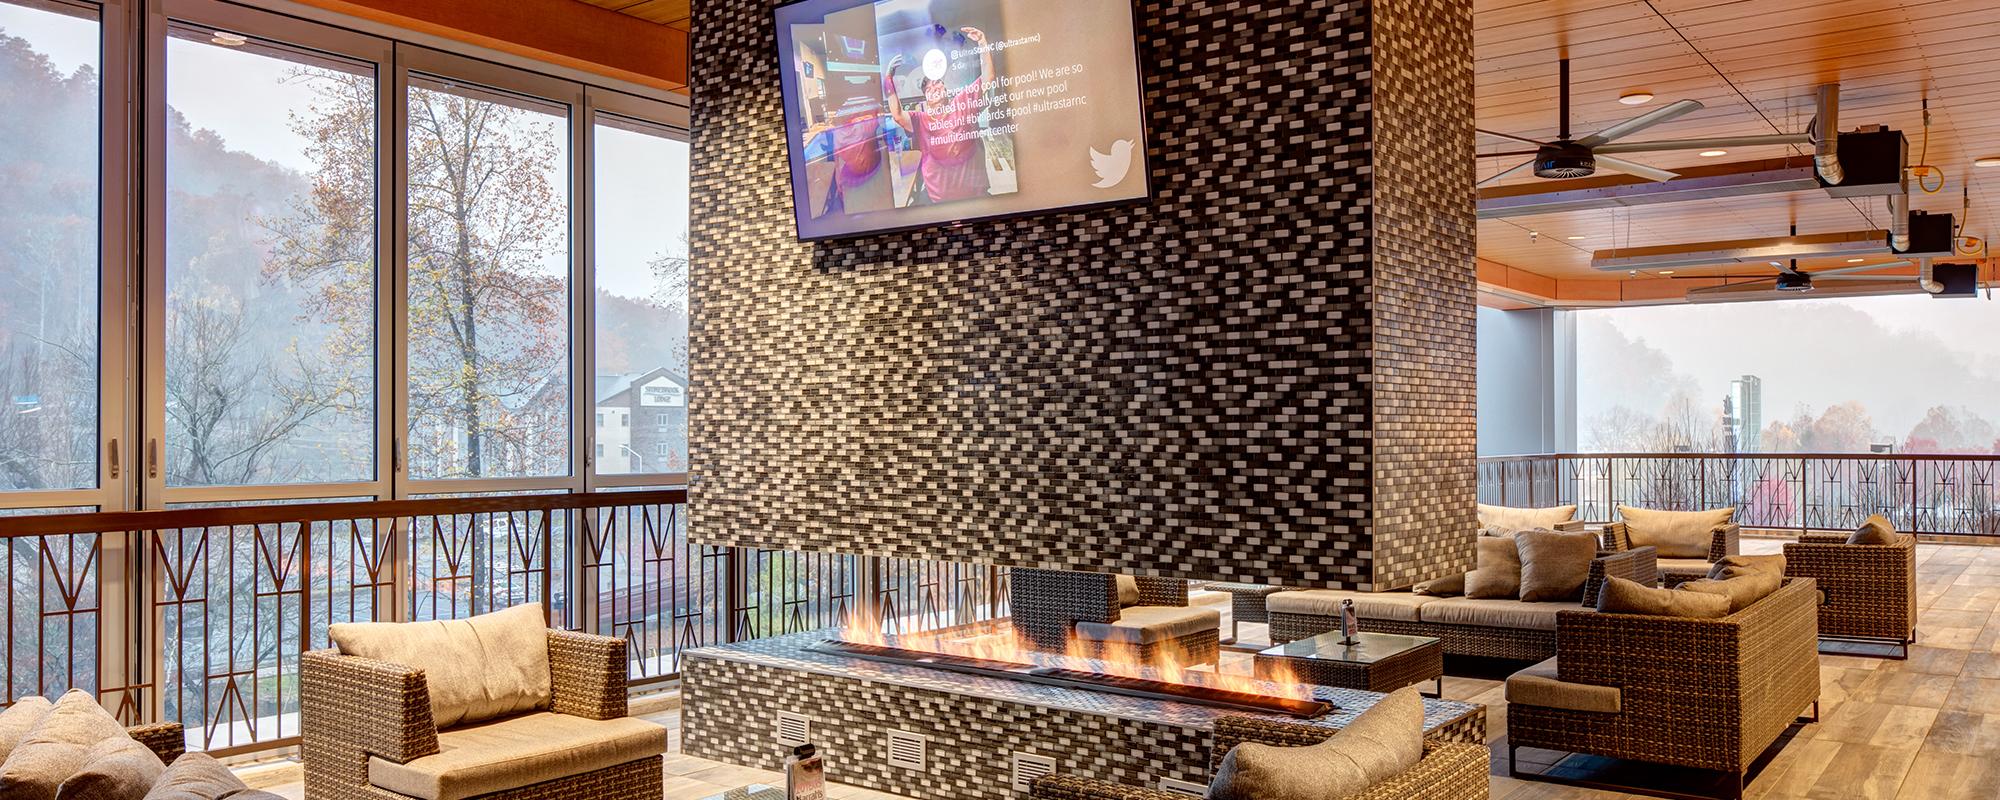 UltraStar Second Floor Patio and Bar